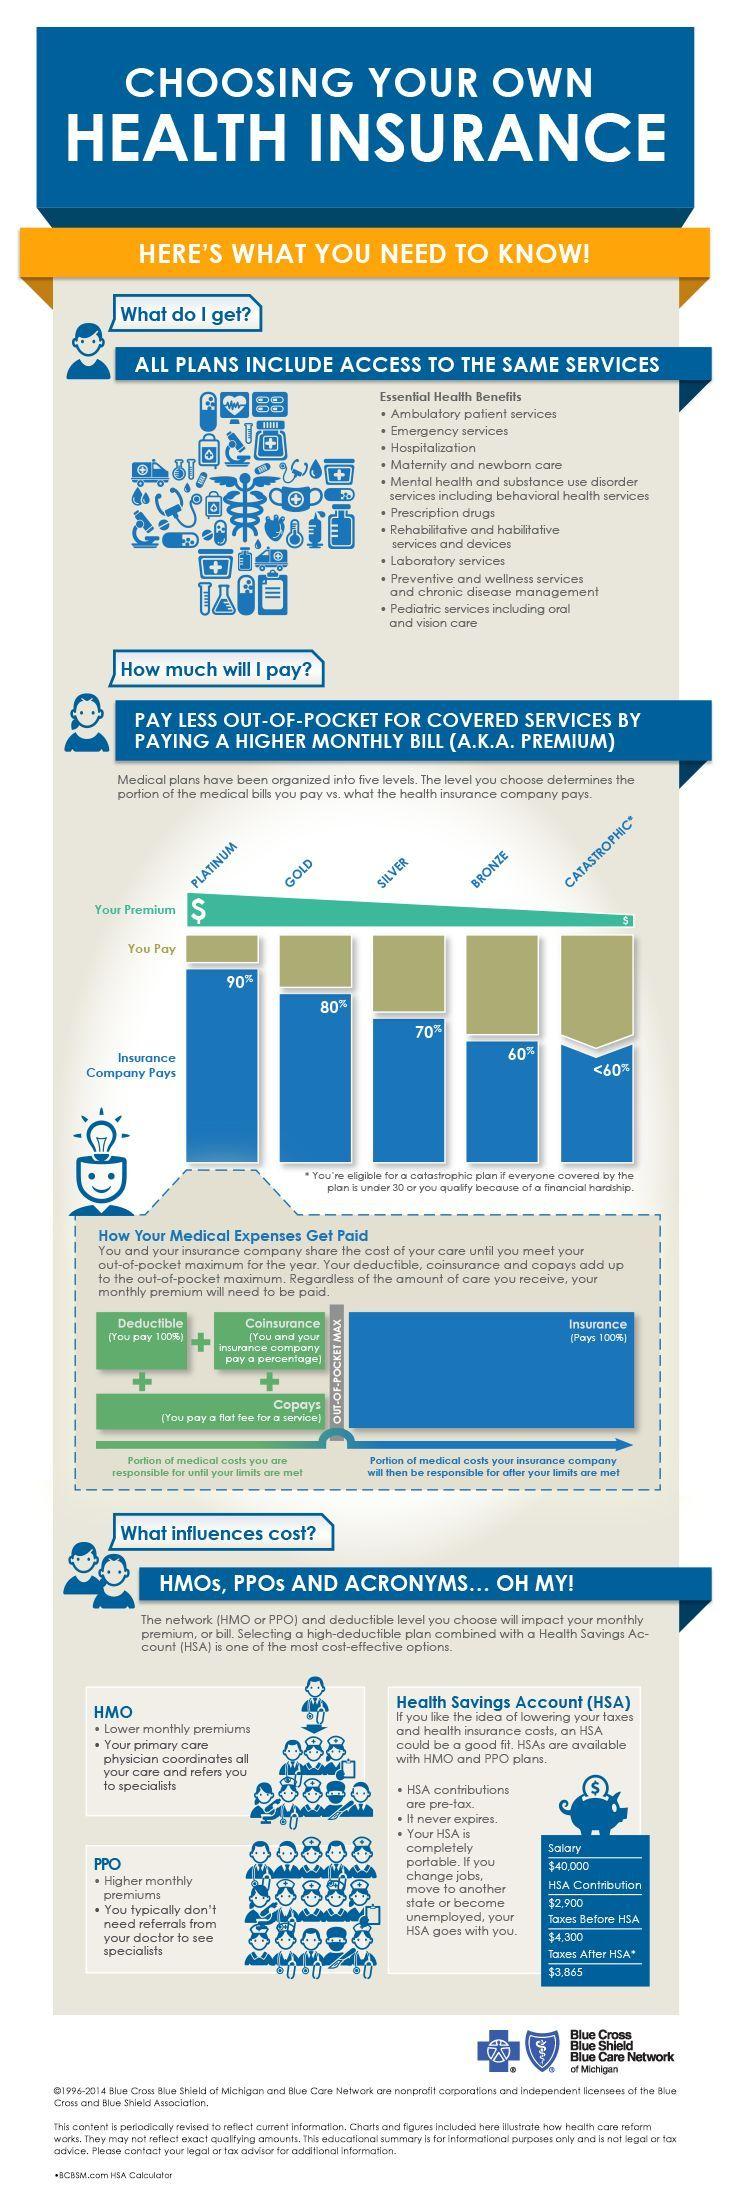 Choosing Your Own Health Insurance Health Insurance 101 Blue Cross Blue Shield Of Mic Health Insurance Companies Life Insurance Facts Free Health Insurance